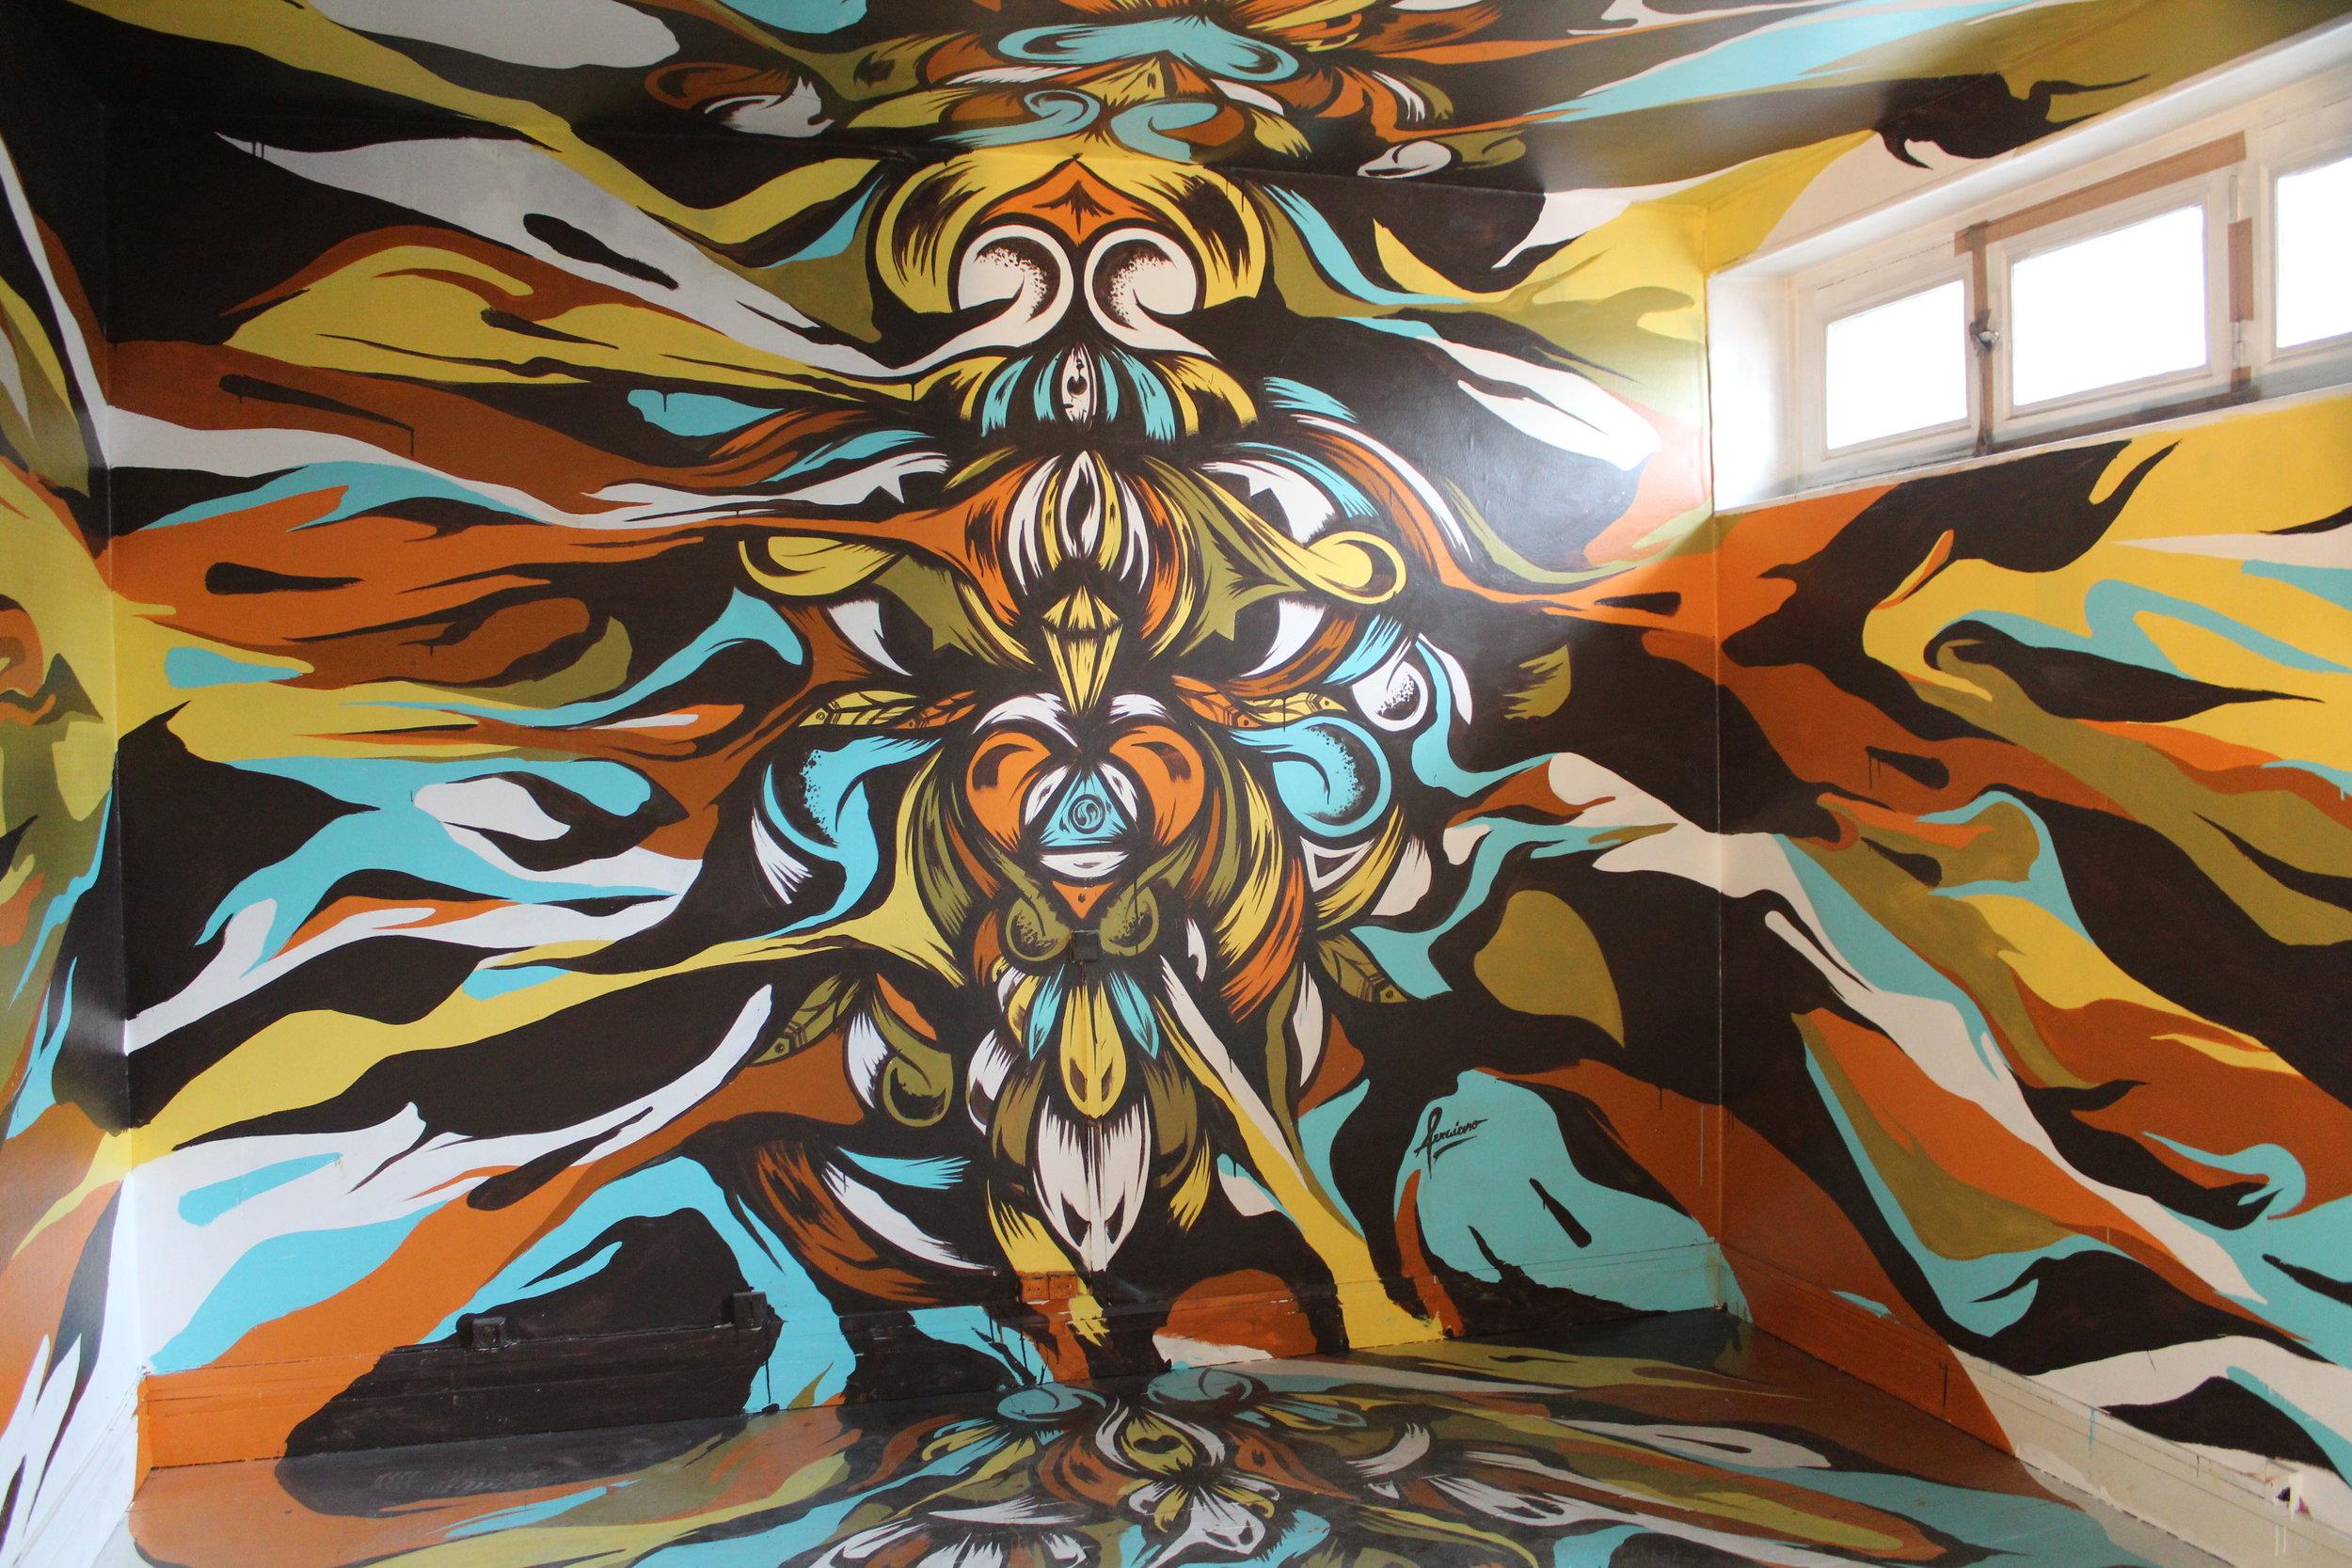 Artist Arraiano, room 922, floor 2, #tourparis13